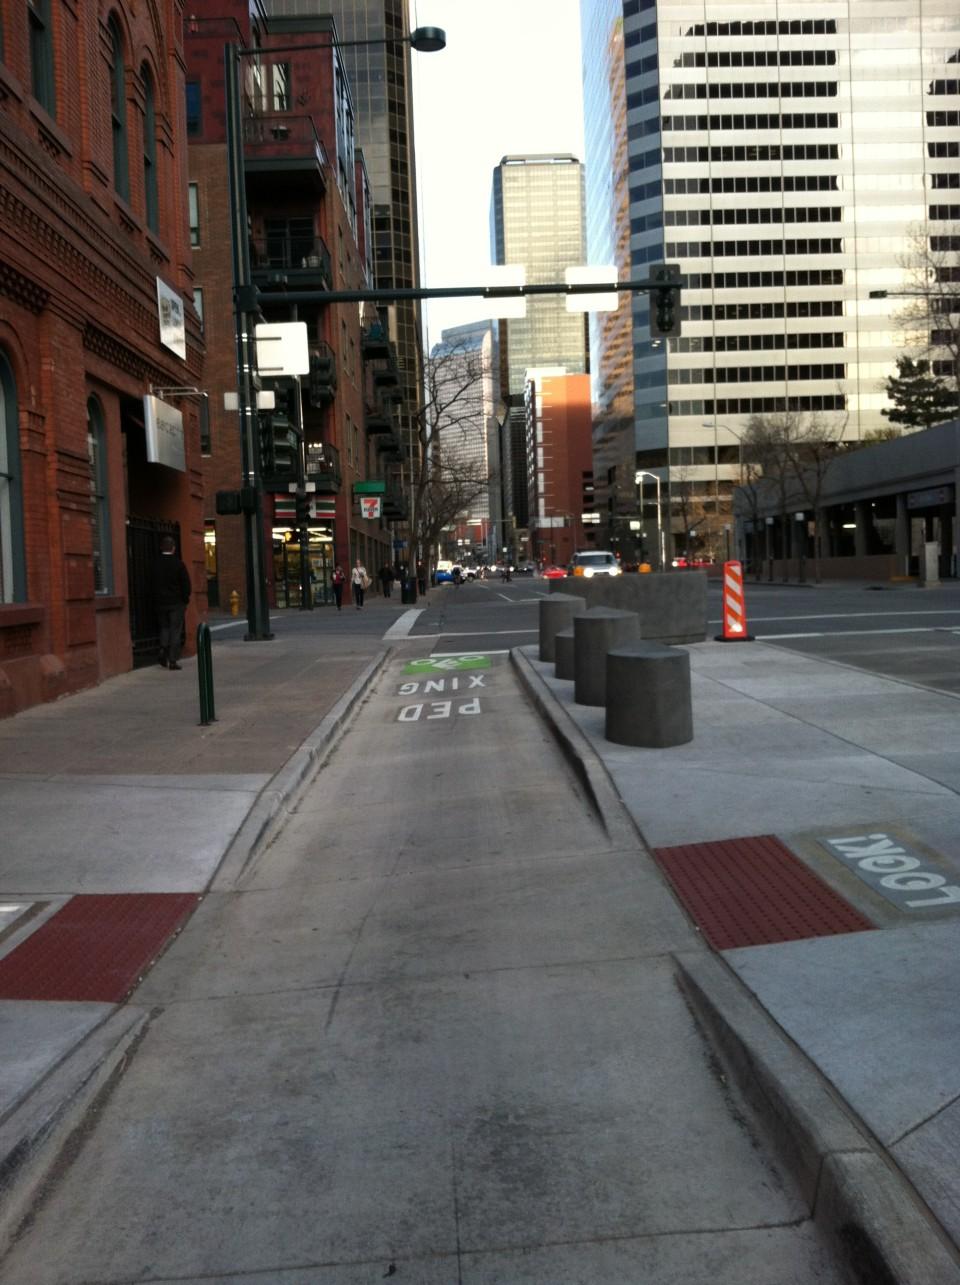 Bike Lane Chicago >> Side Boarding Island Stop - National Association of City Transportation Officials